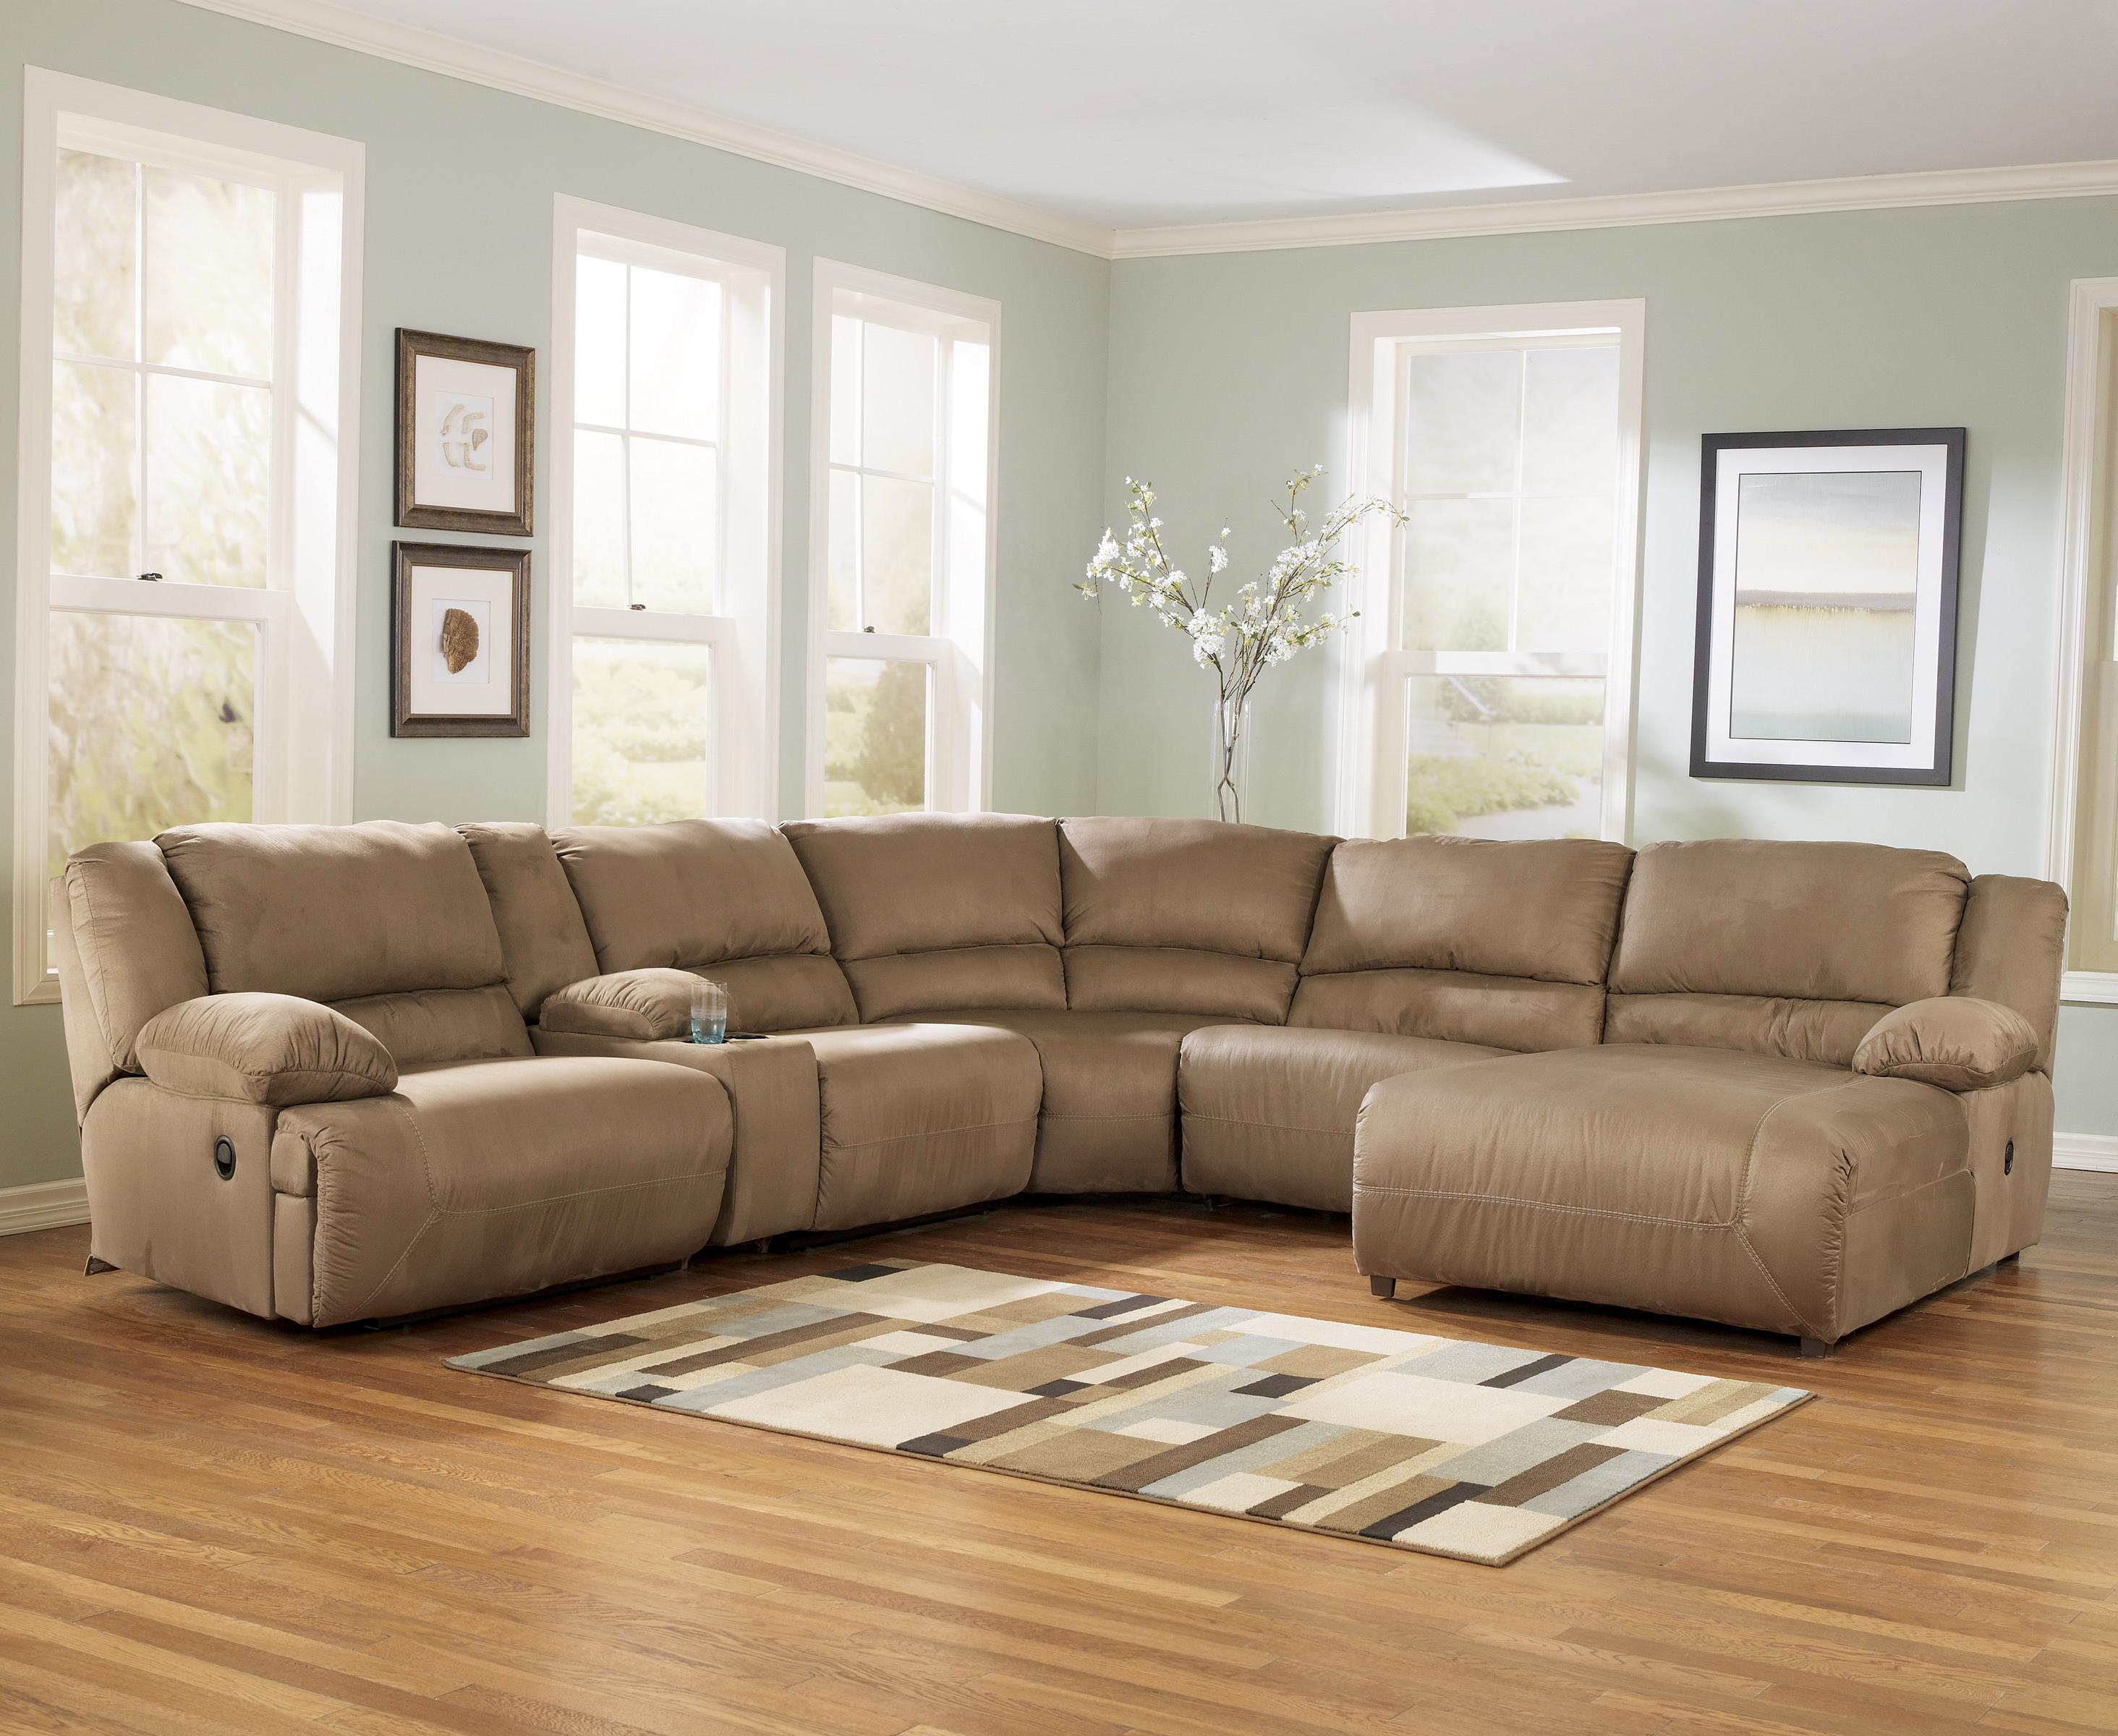 sectional sofa designs for living room light fixture ideas ashley signature design hogan mocha 6 piece motion with group